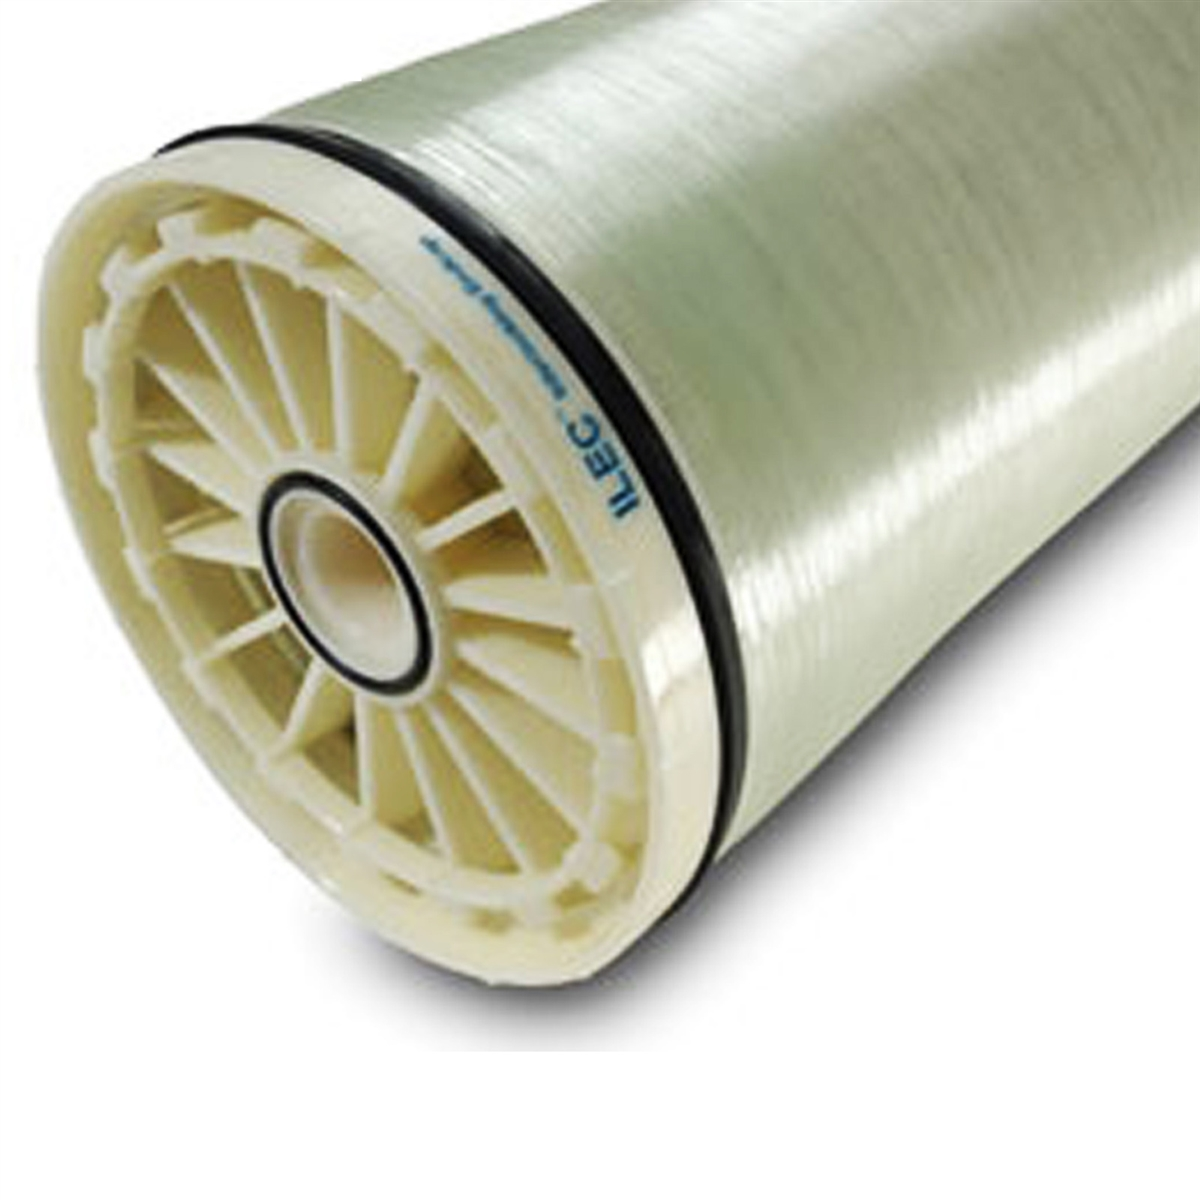 Dow Filmtec BW30HR 440i Brackish Water RO Membrane